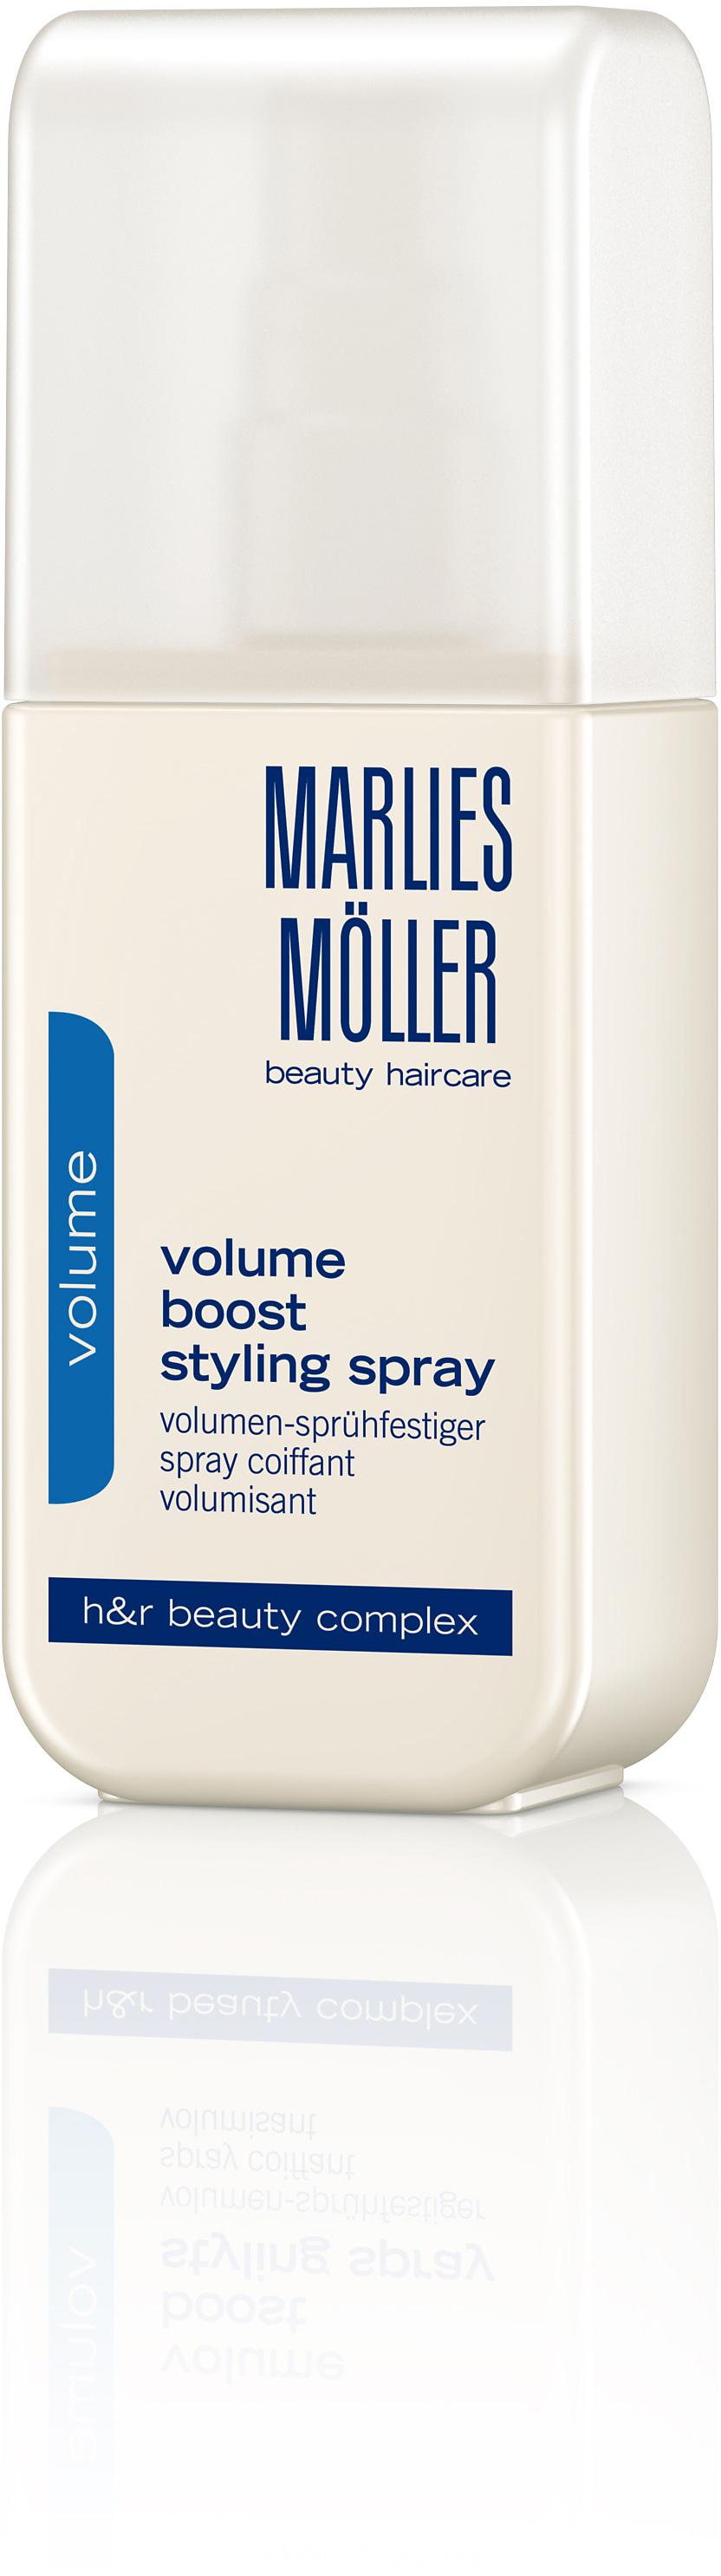 Marlies Möller Style Volume Boost 125 ml